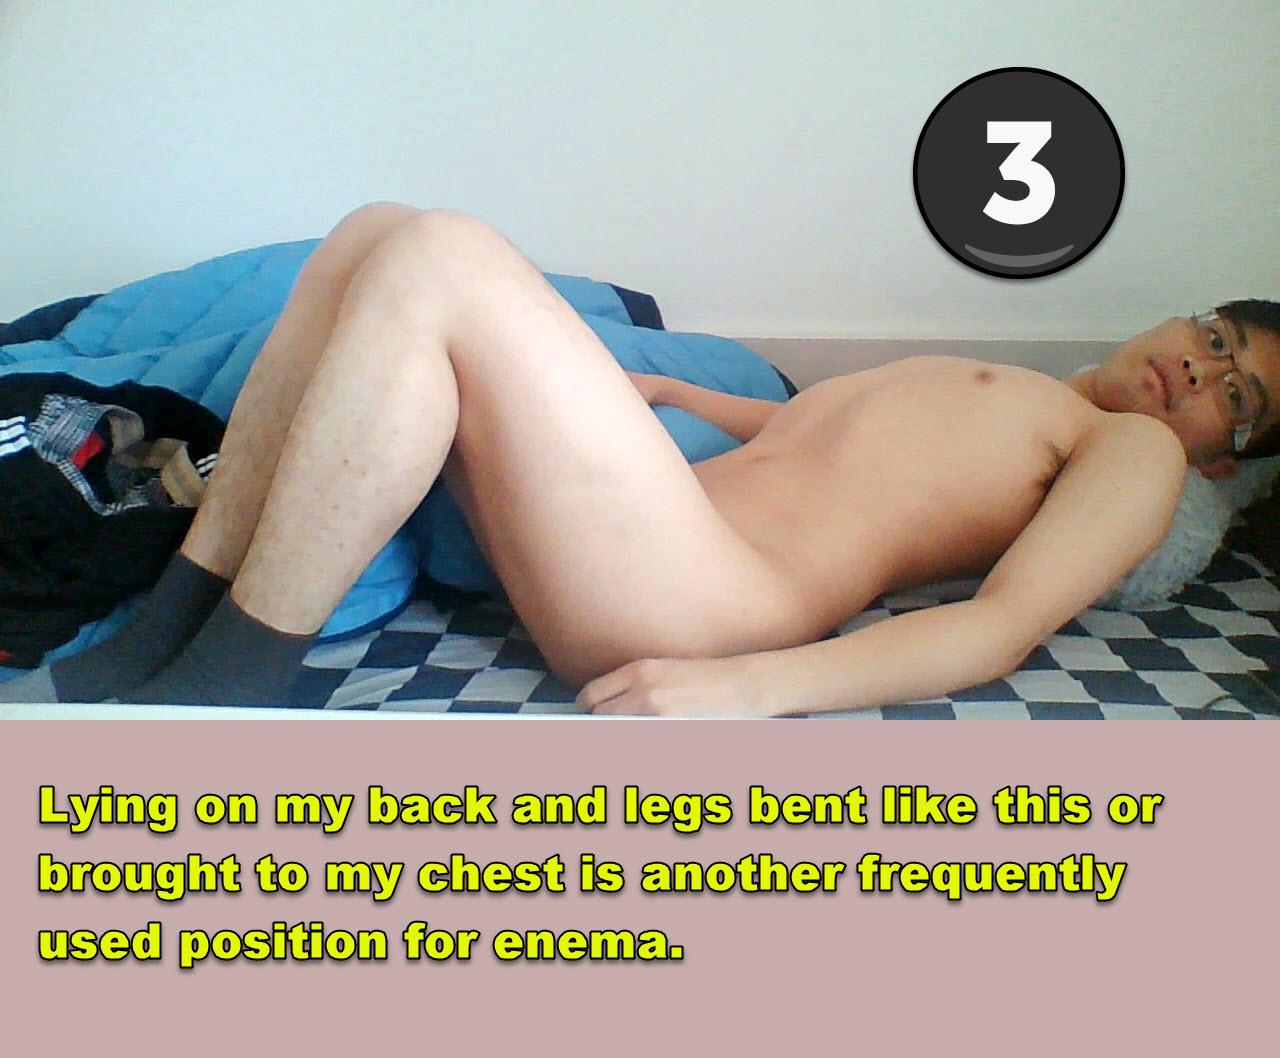 lying on my back for enema